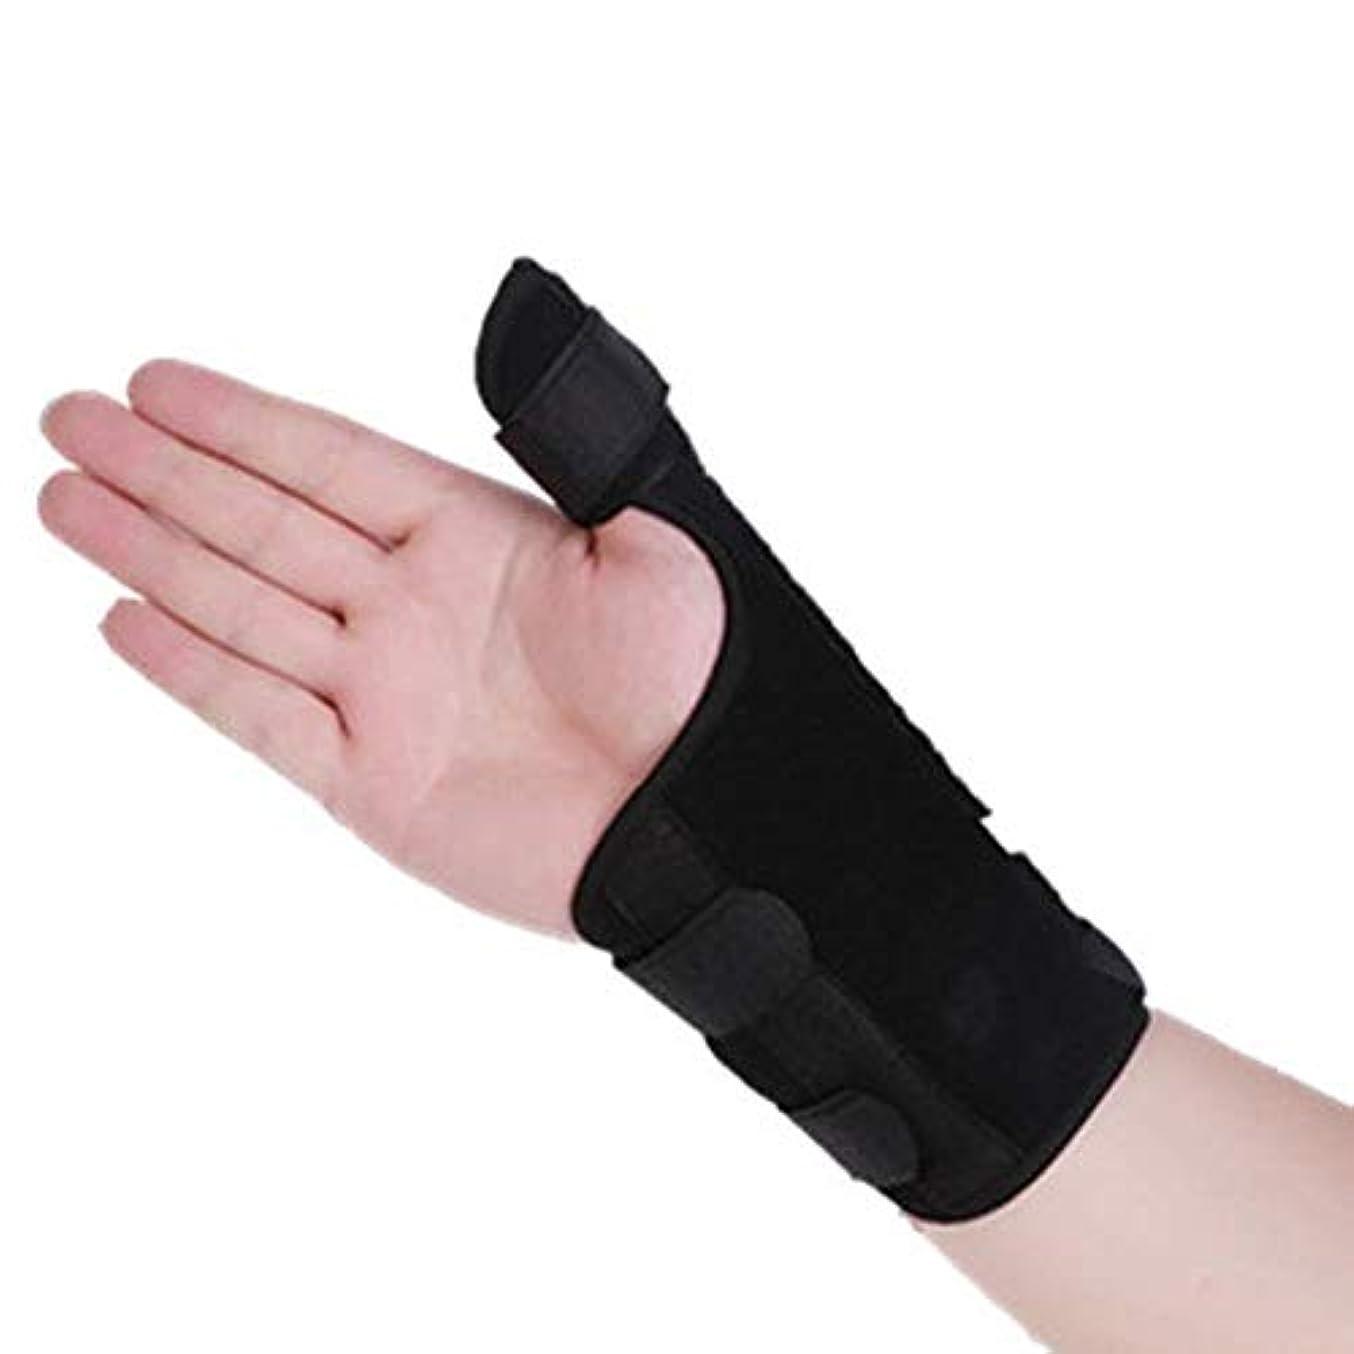 汗神社悲観主義者指の添え木、手根管関節炎Sprain-1pairs用通気性医療手首サポートブレース添え木 (Size : Medium)